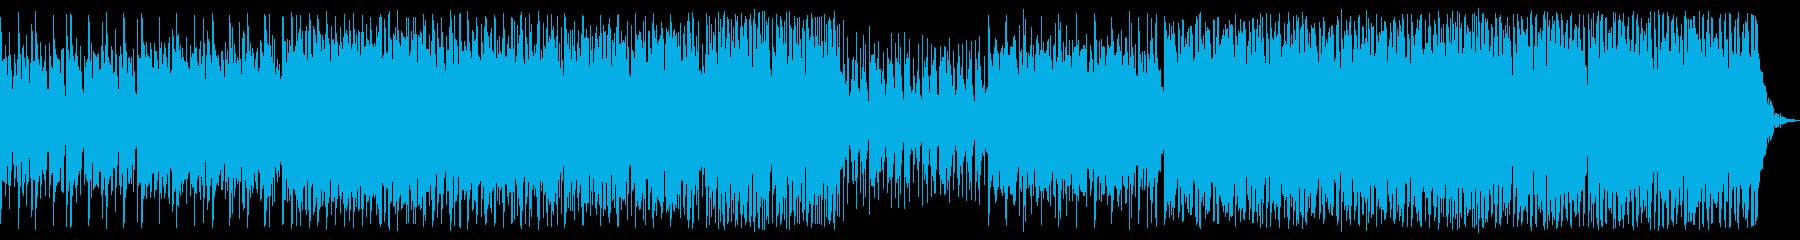 BGM018-01 オーケストラBGM…の再生済みの波形